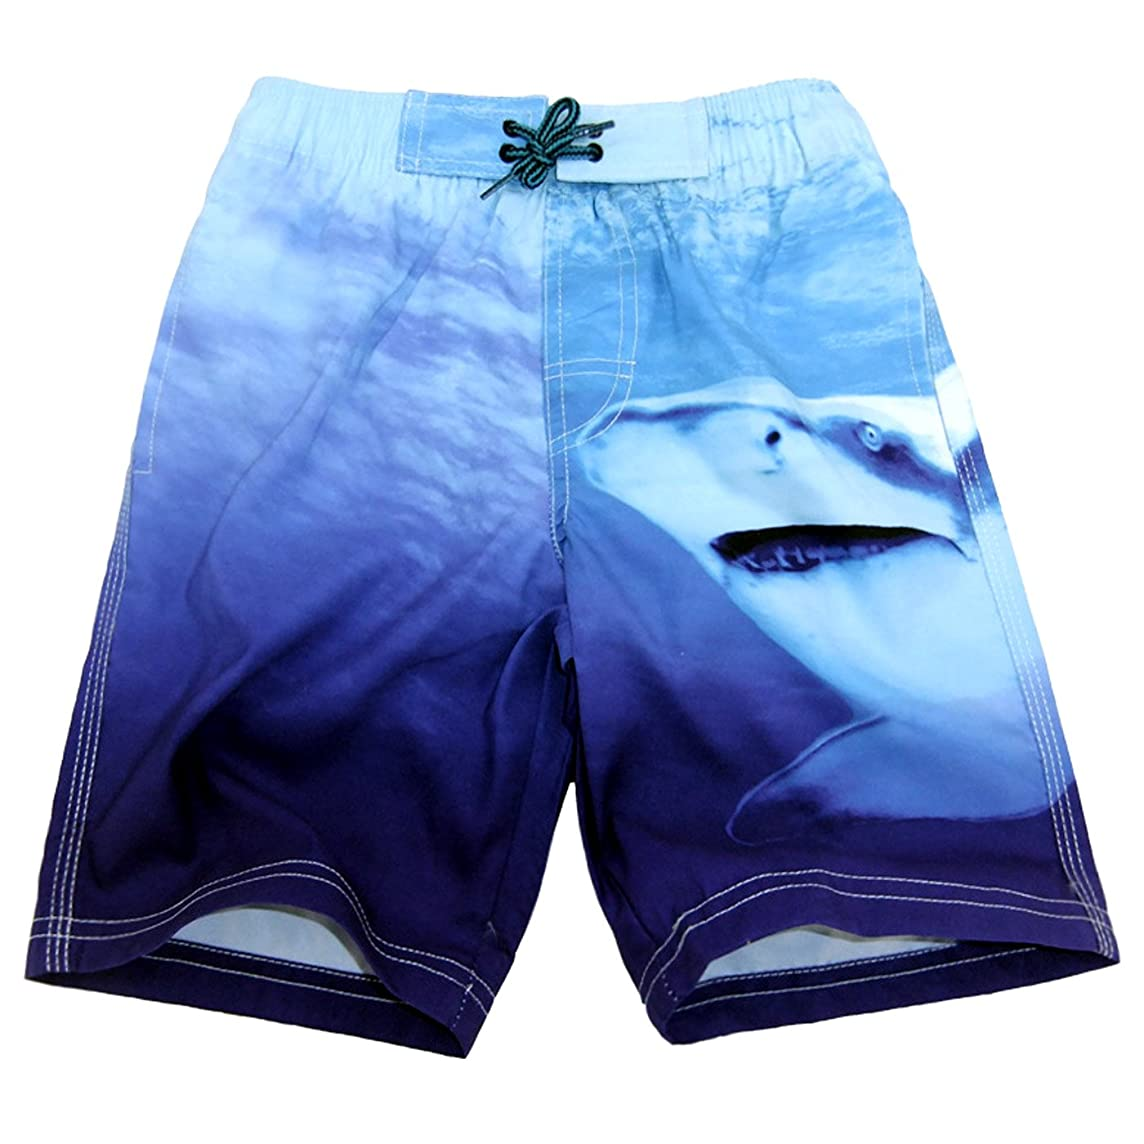 Boys Swim Trunk Drawstring Shark Varied Blue Quick Dry Swimming Beach Shorts